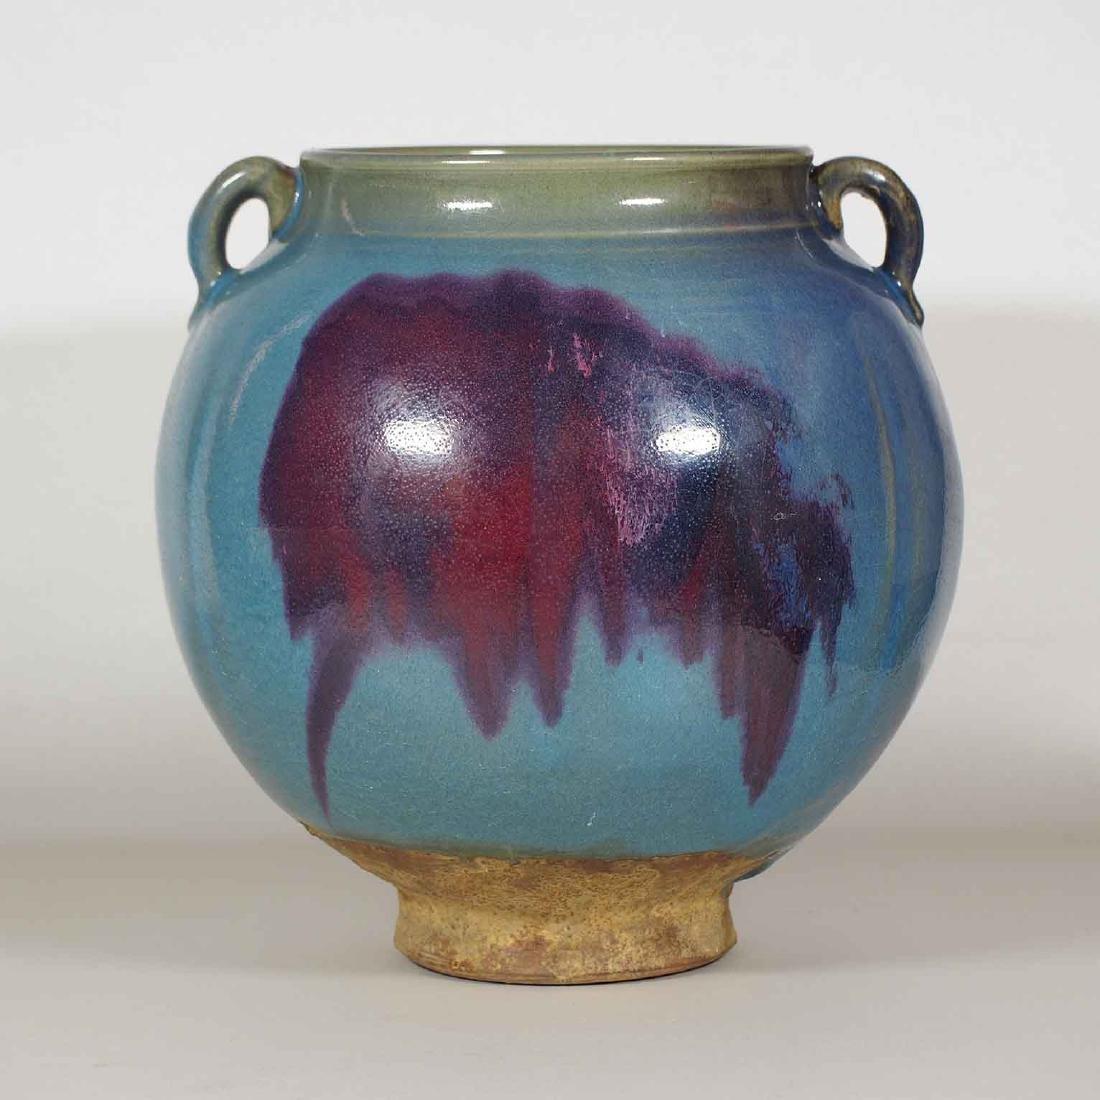 Large Jun Jar with Purple Splash and Two Lugs, Yuan